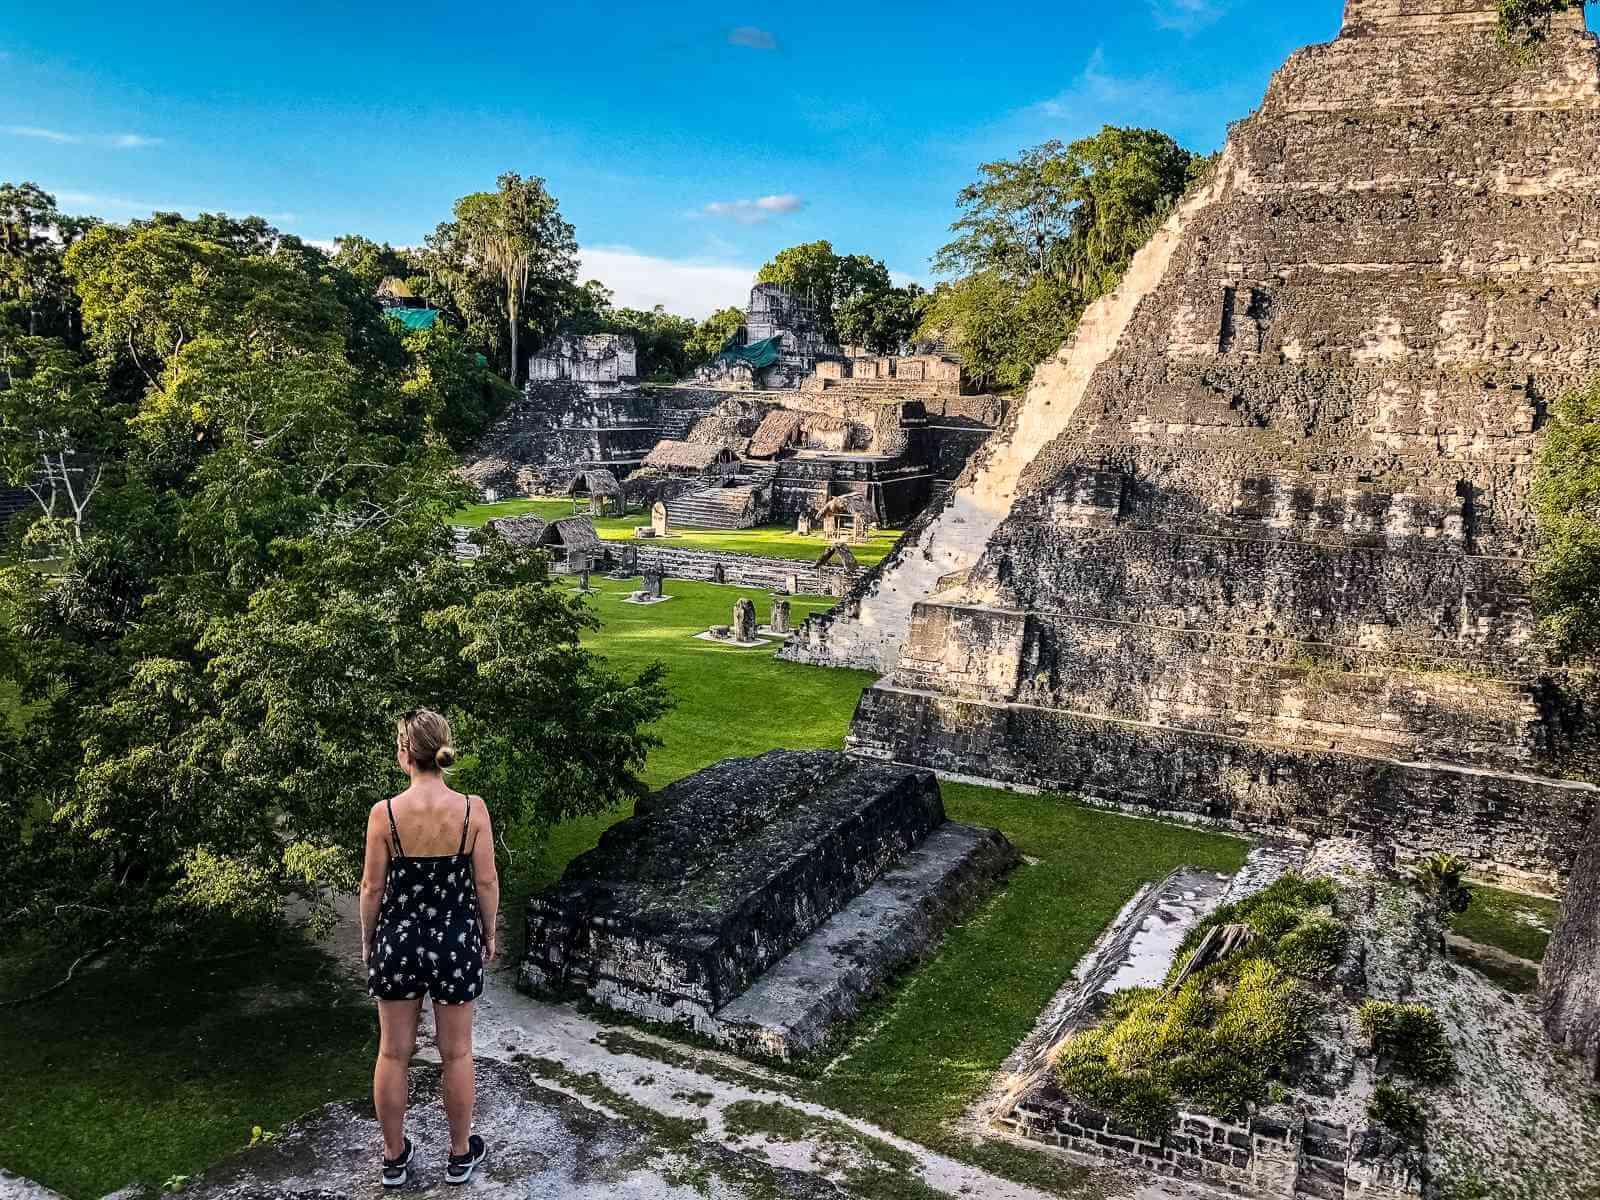 Tikal - Hart van het oude Maya rijk